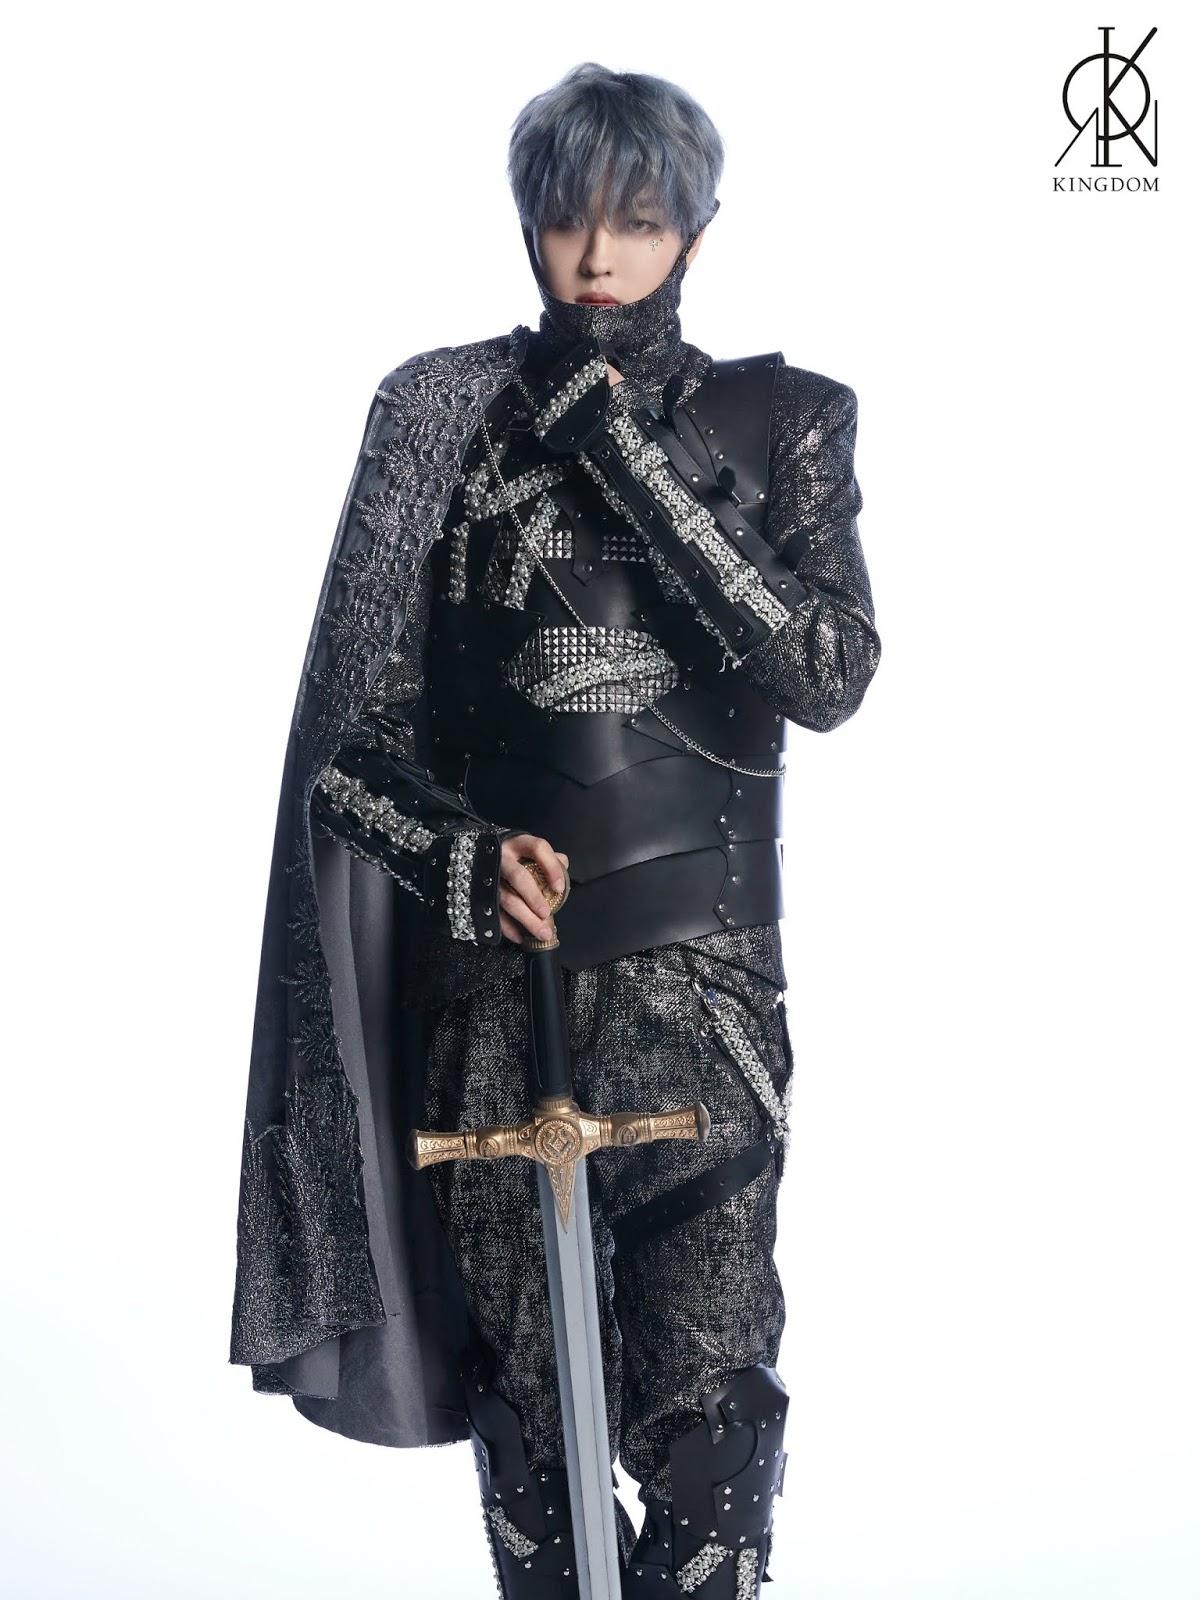 kingdom excalibur teaser louis